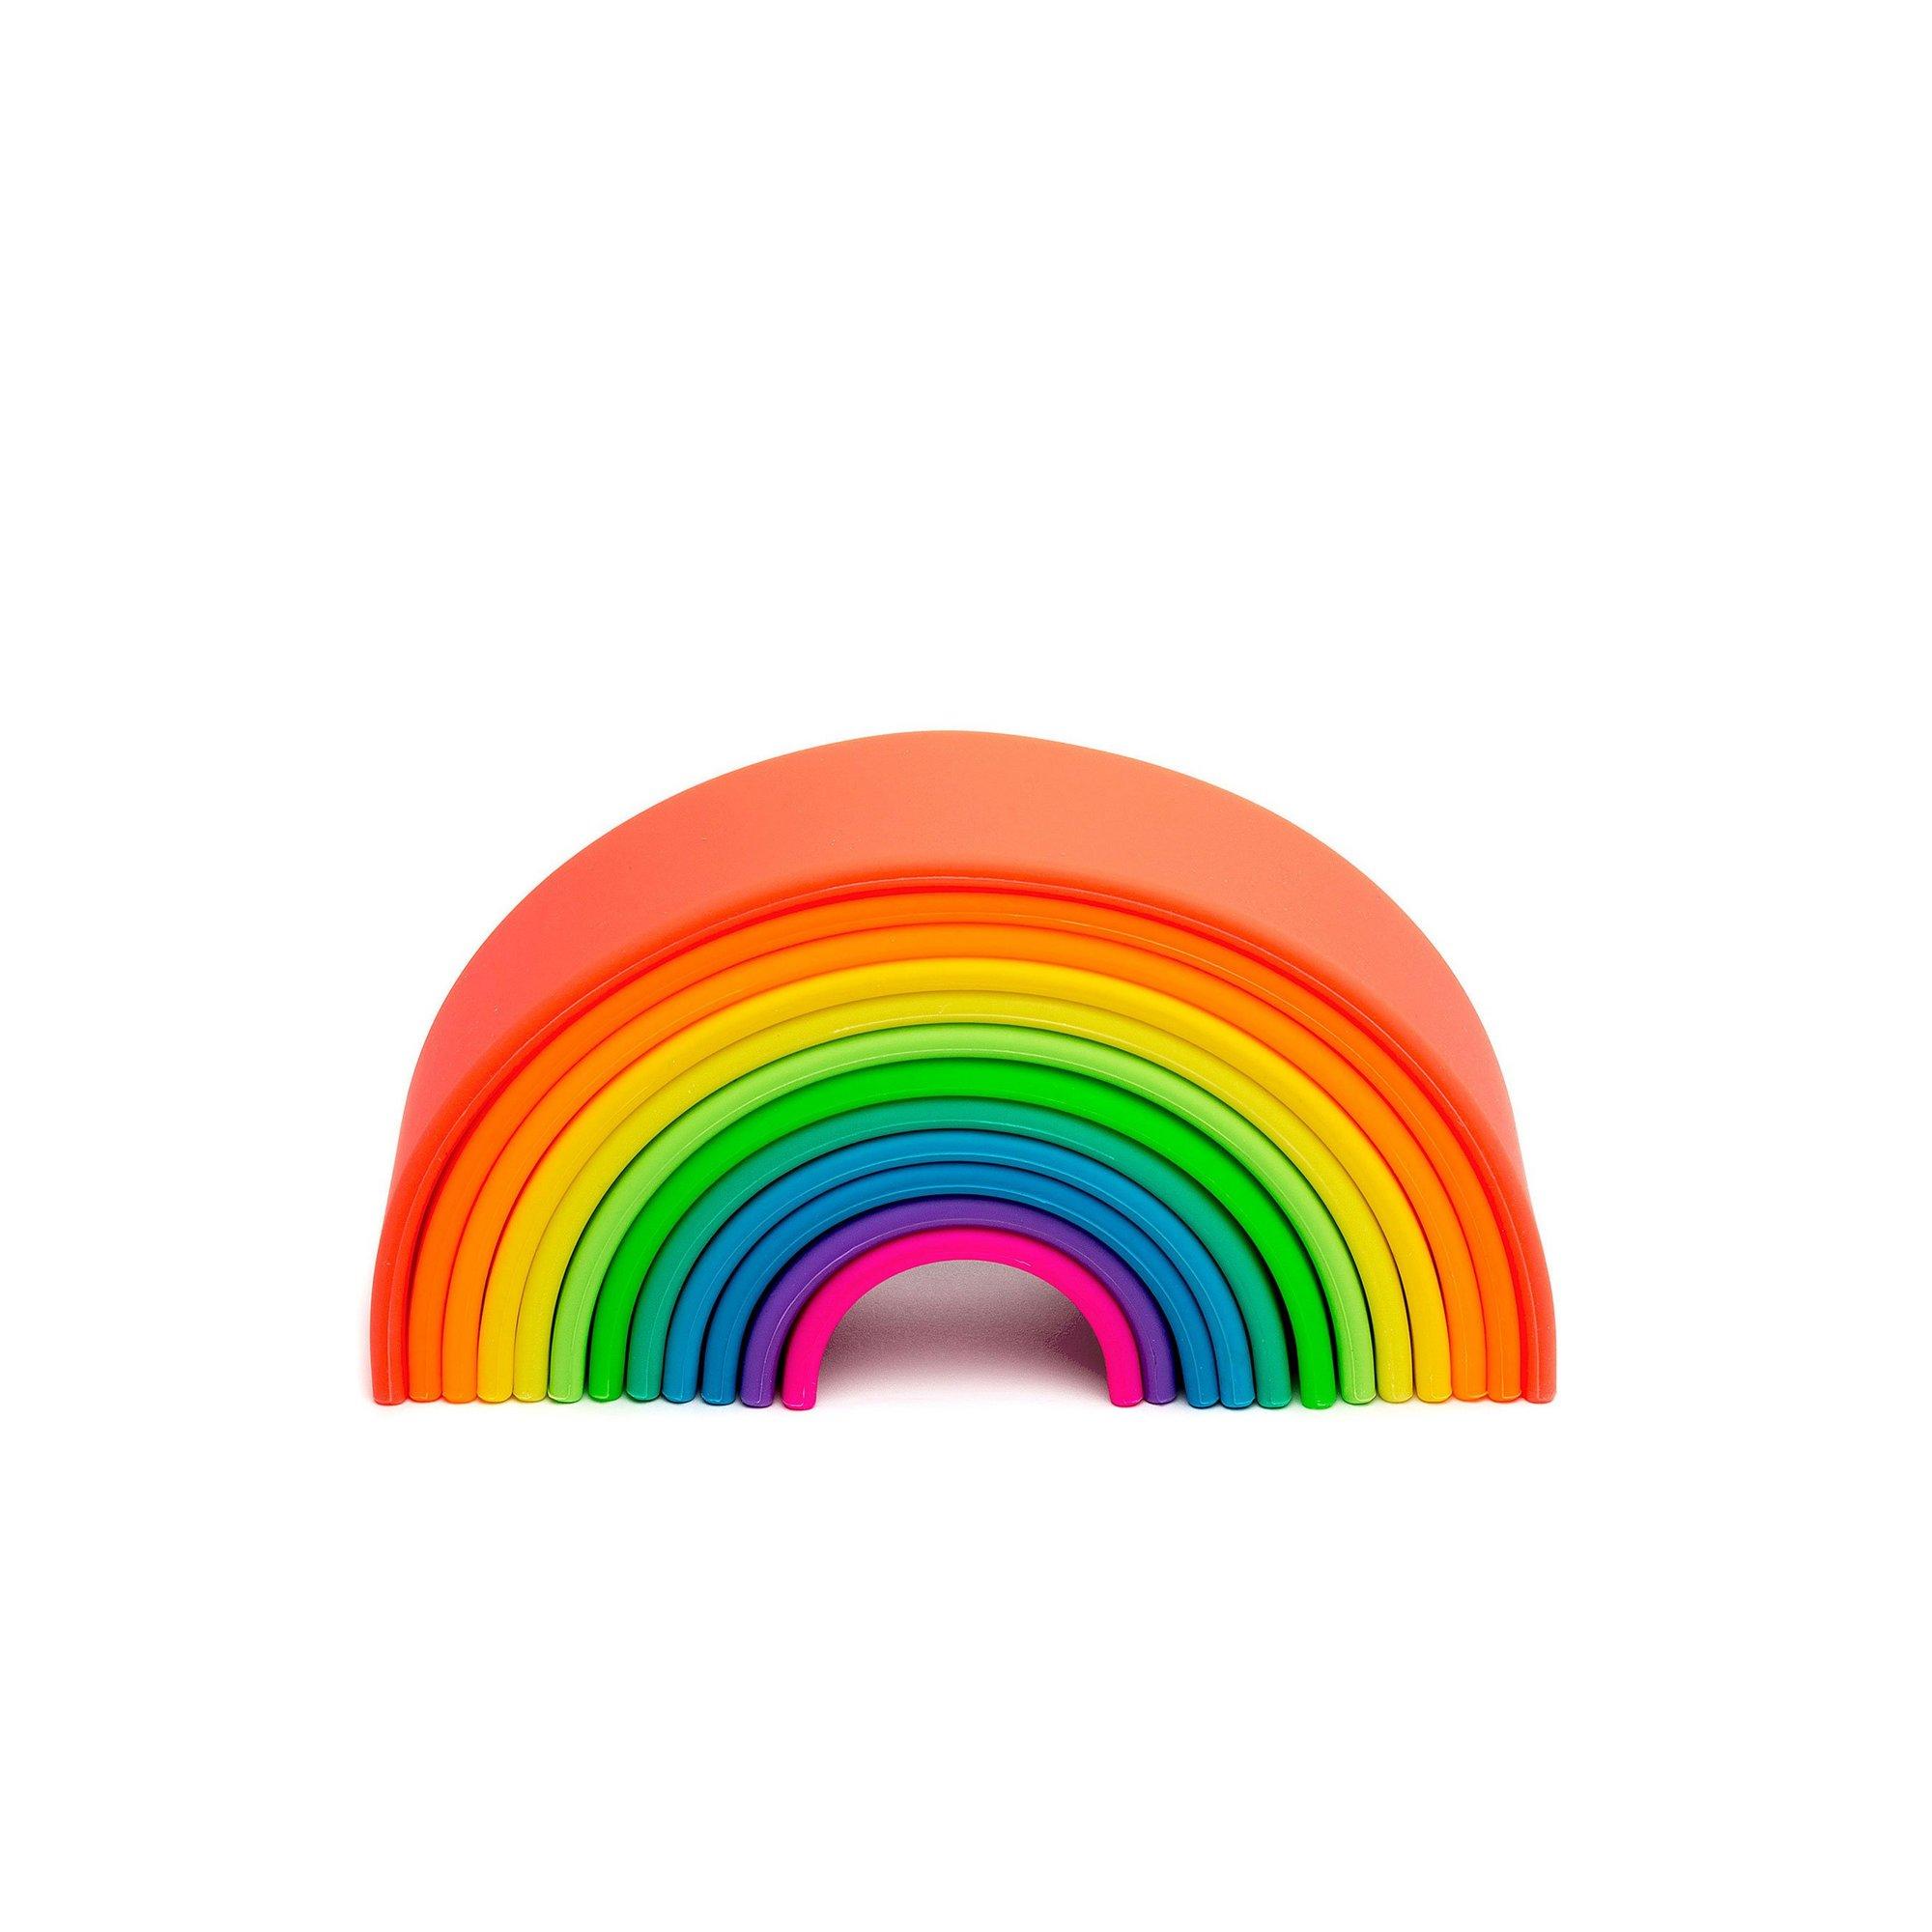 Image of Dena 12 Piece Silicone Rainbow Toy